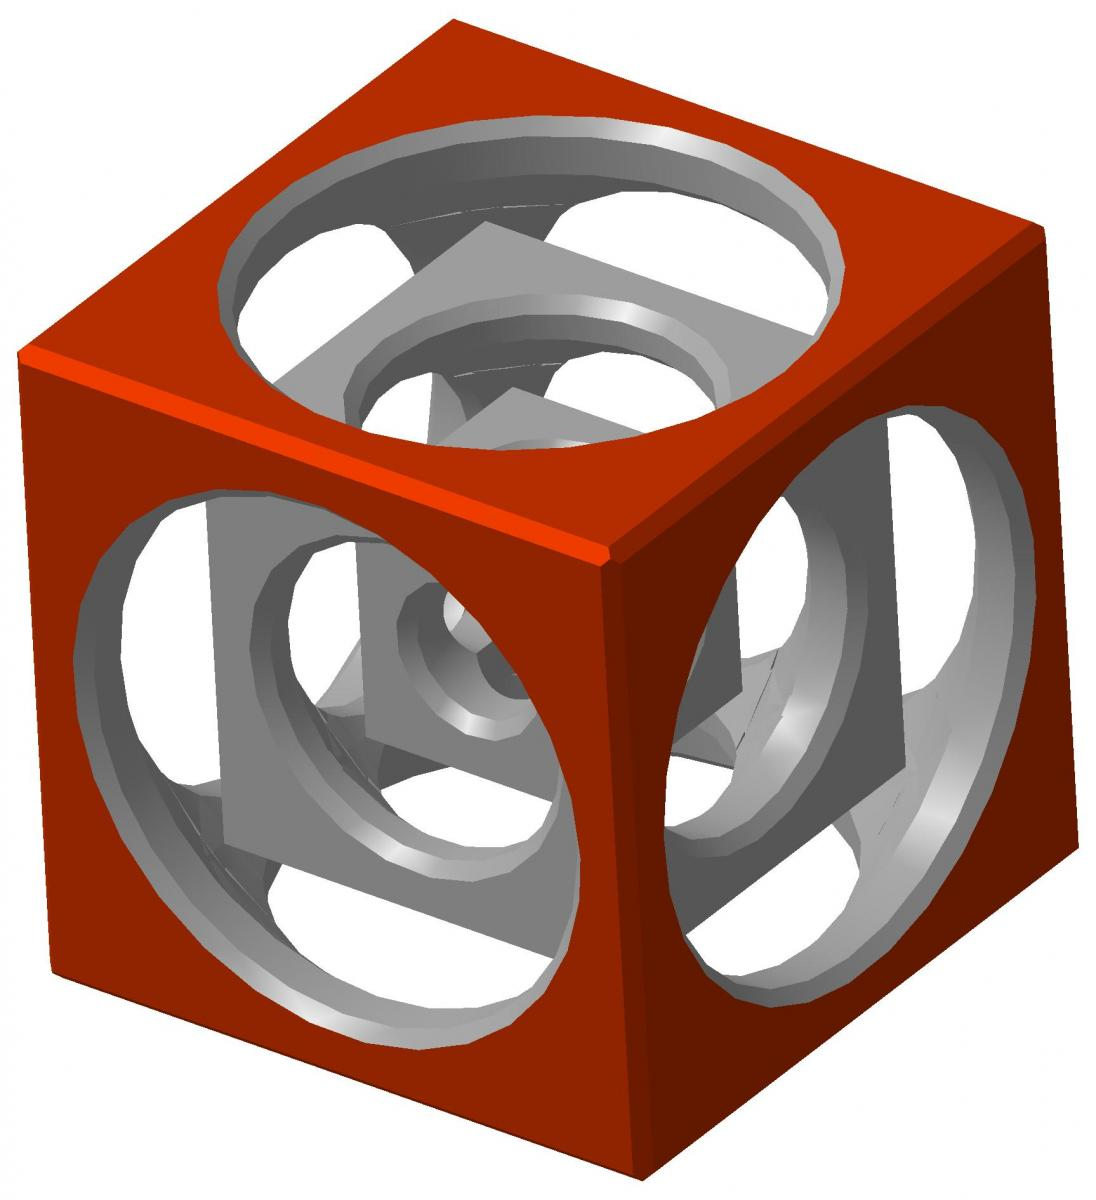 кубик4.jpg